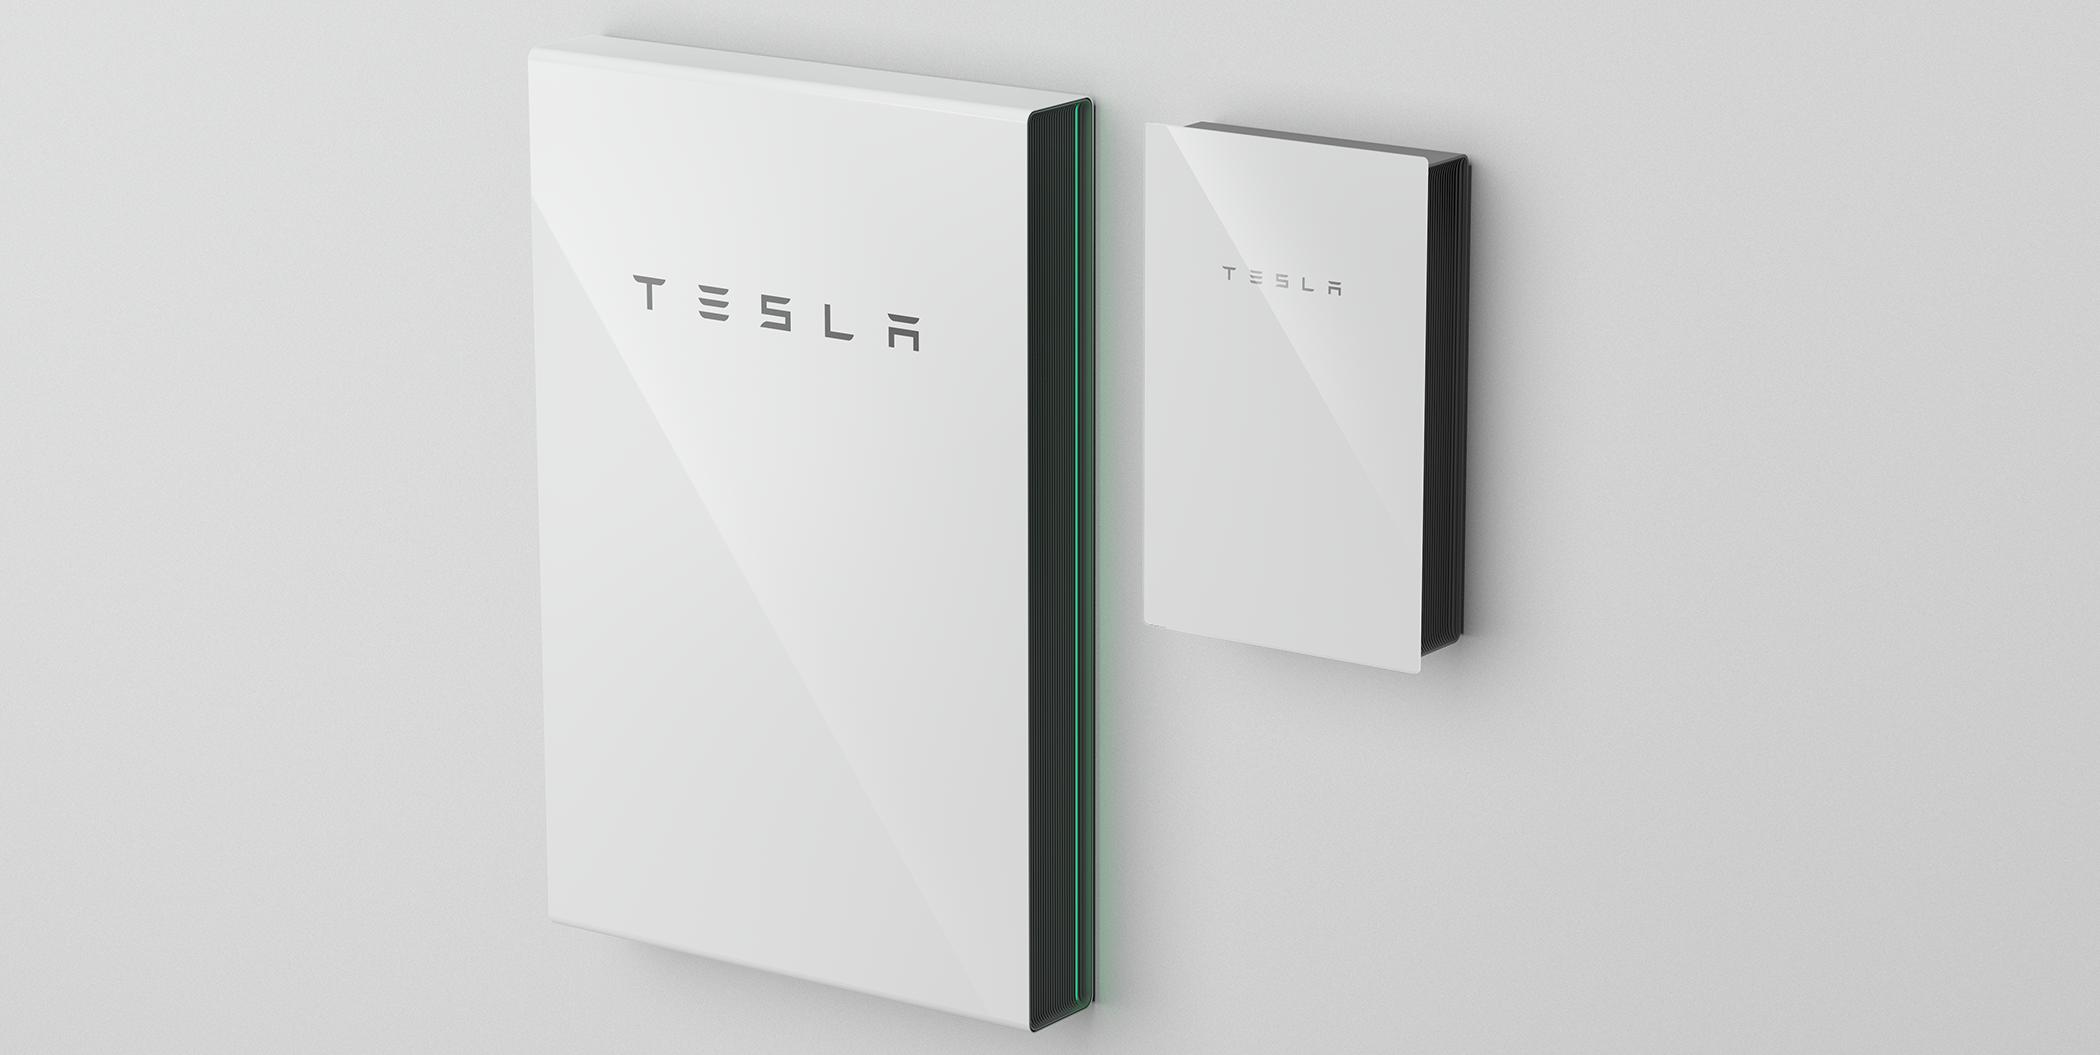 Tesla Launches Backup Power Through Powerwall 2 In Europe With New Hardware Powerwall Tesla Powerwall Tesla